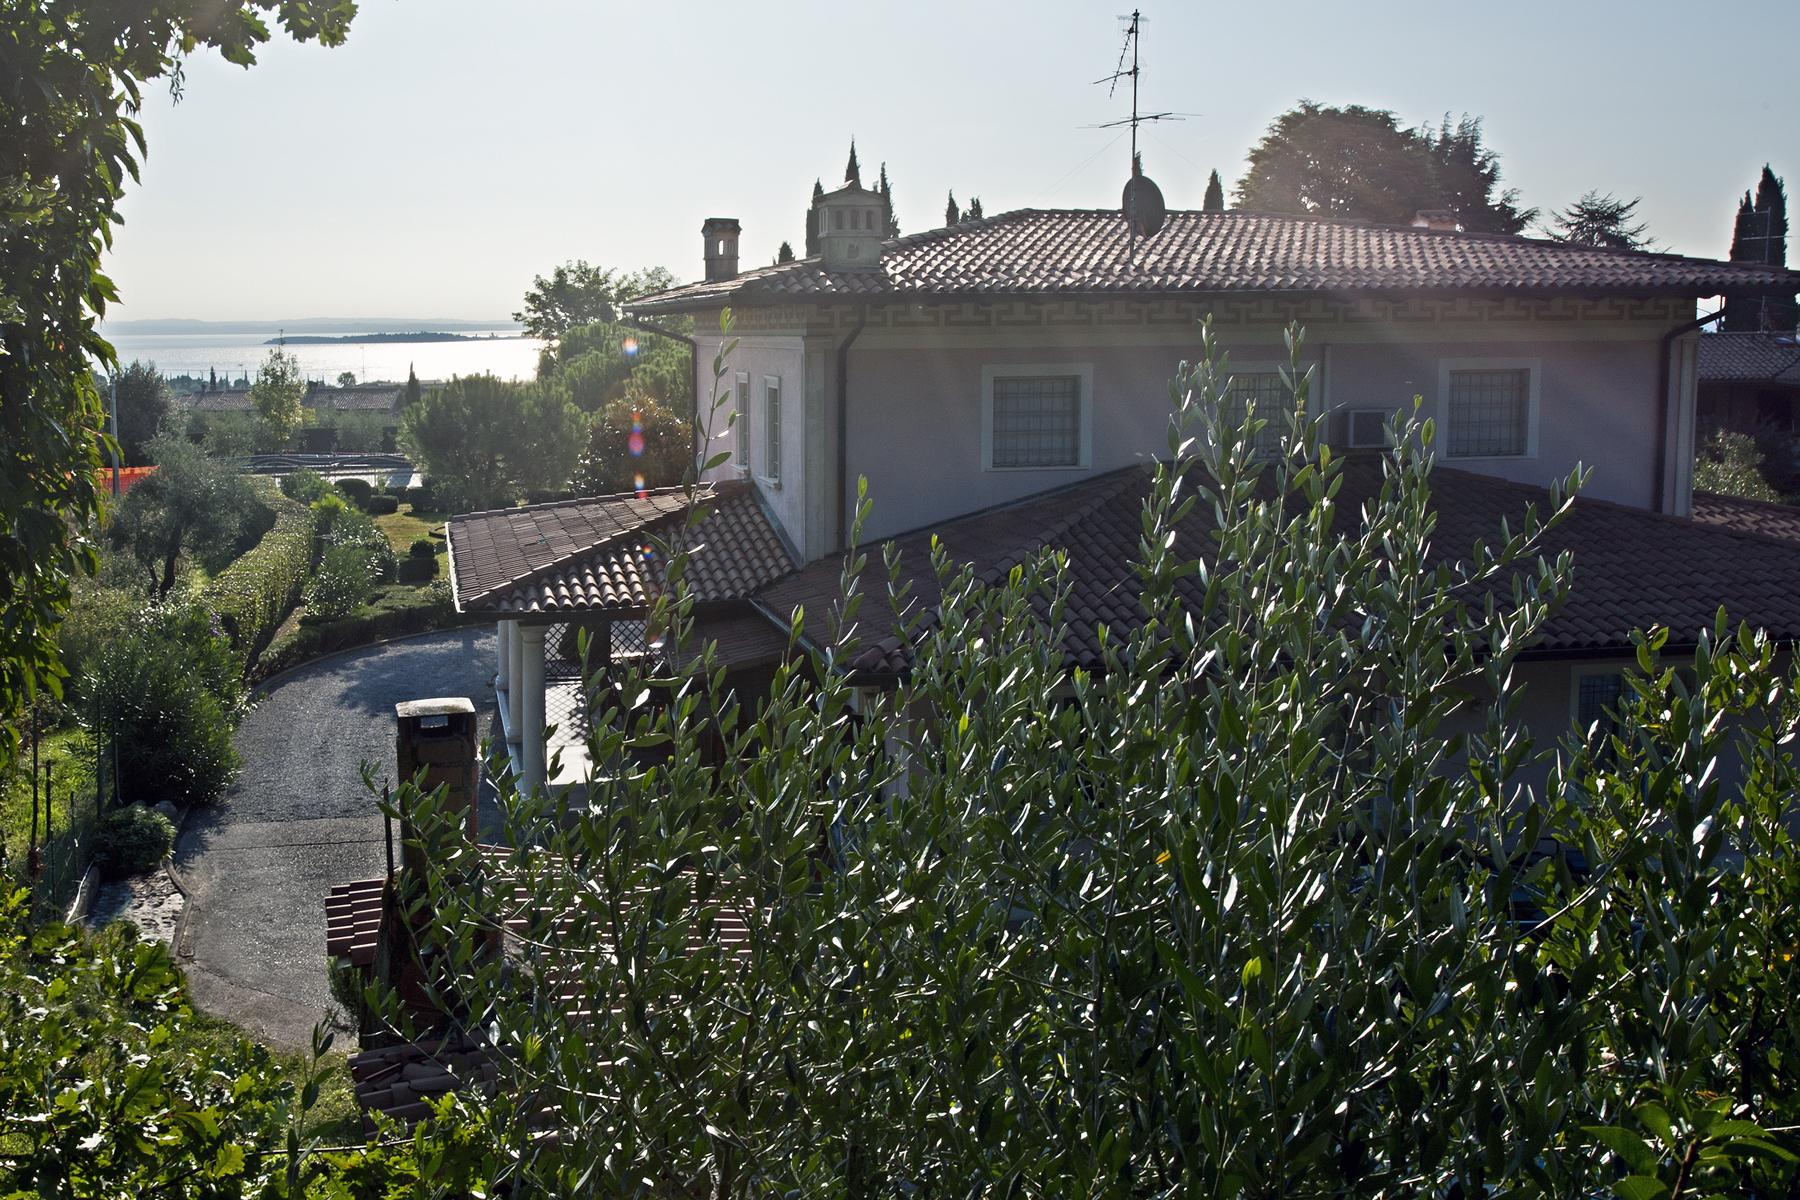 Villa in Vendita a Padenghe Sul Garda: 5 locali, 400 mq - Foto 6